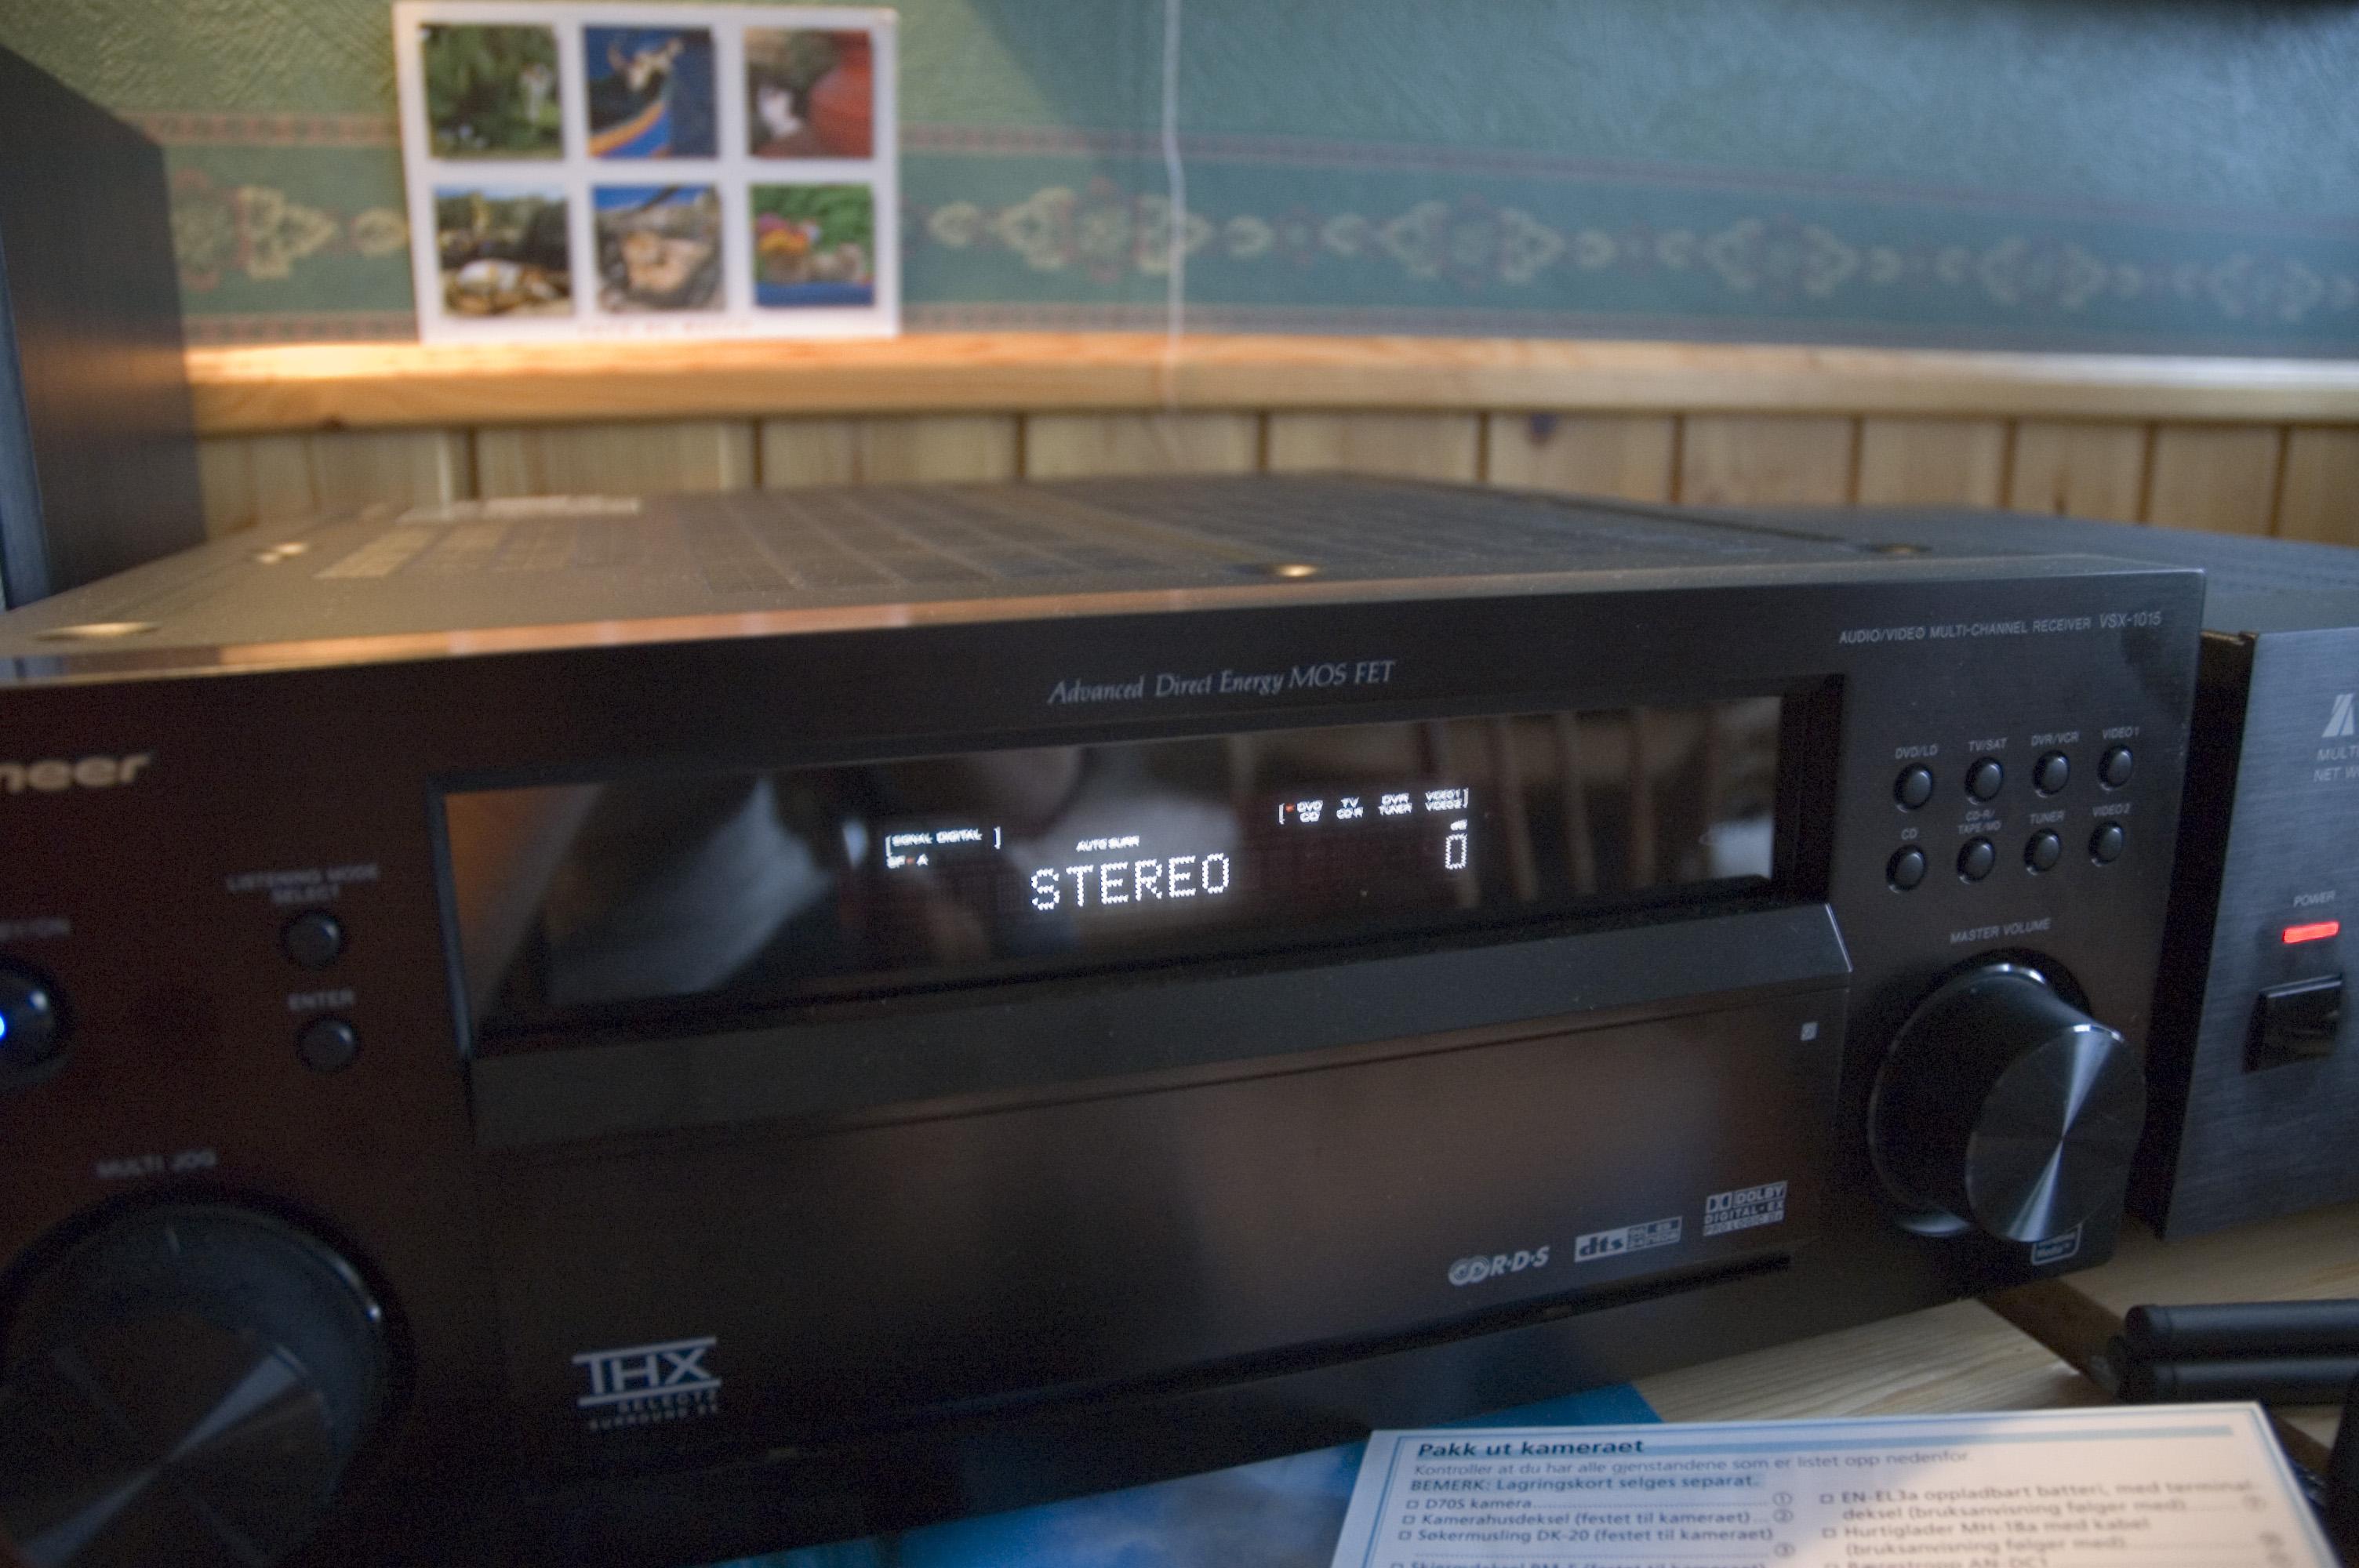 Pioneer VSX-1015 at 0dB